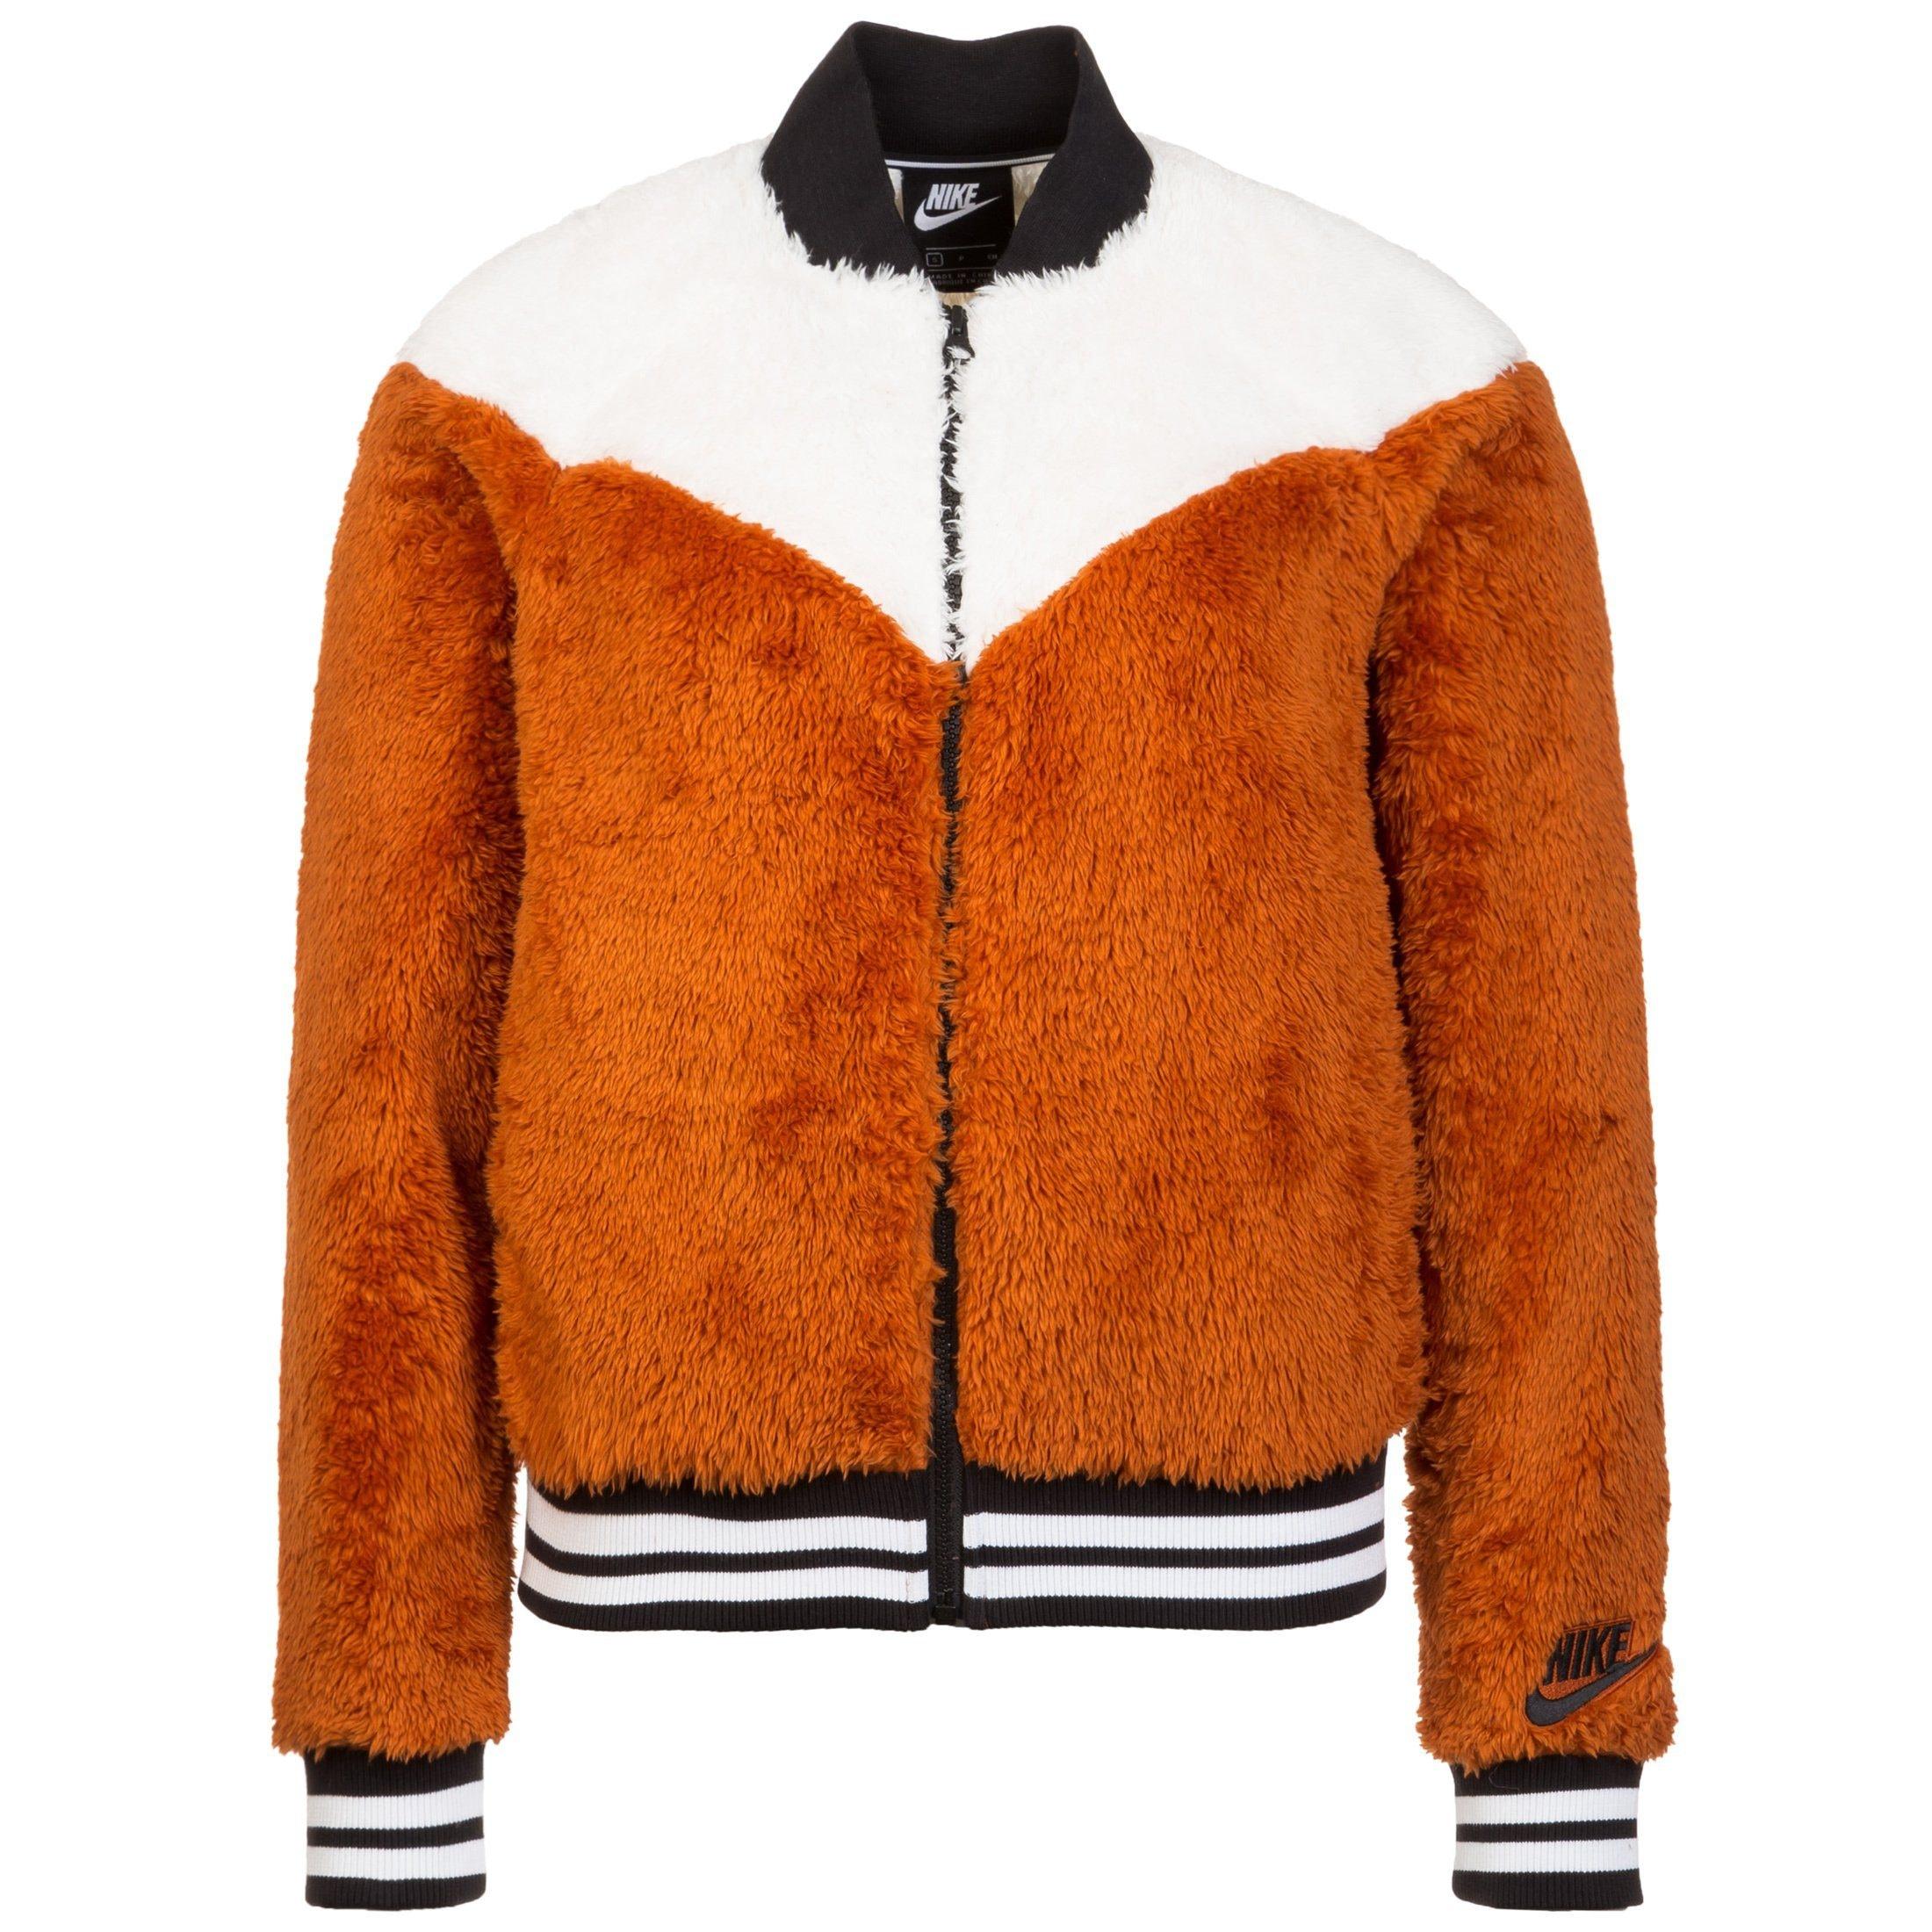 Nike Sportswear Bomberjacke »Bomber Wolf« für Damen | BAUR